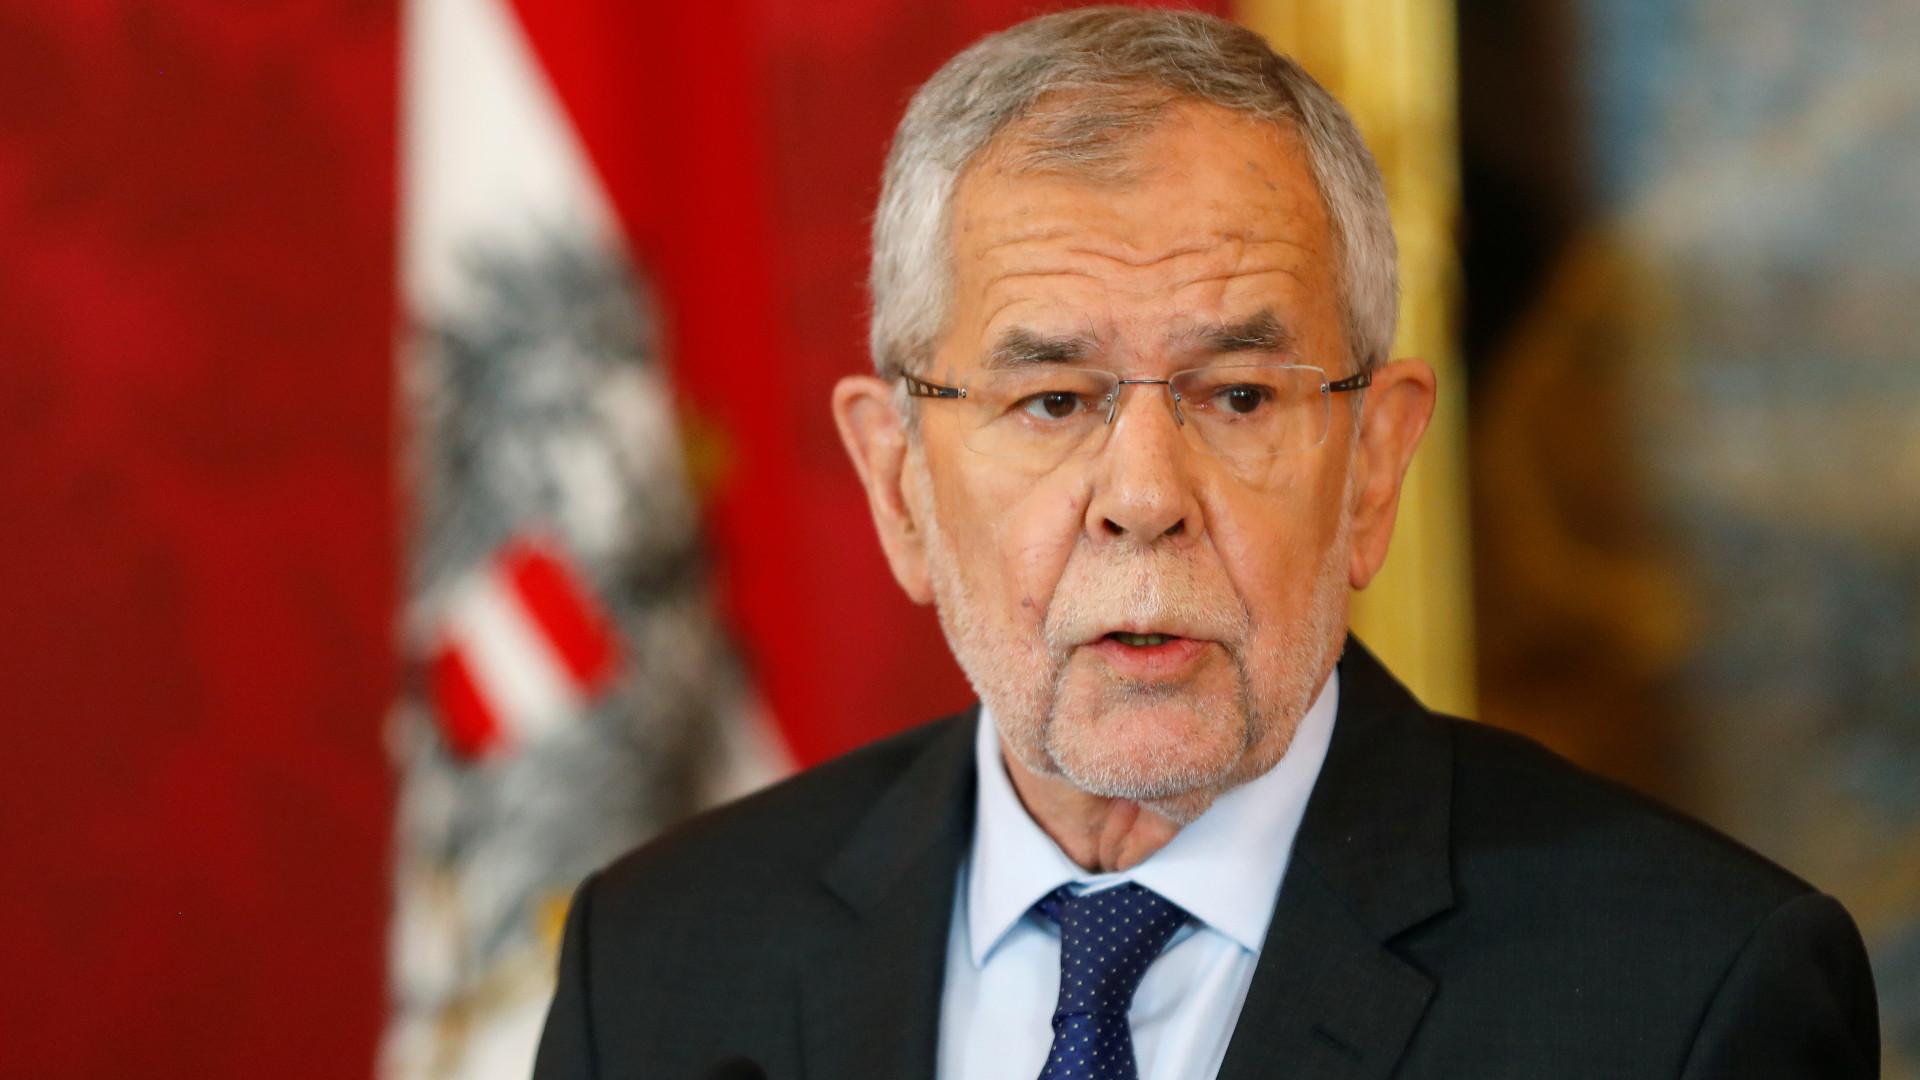 Após escândalo, presidente austríaco pede eleições já para setembro